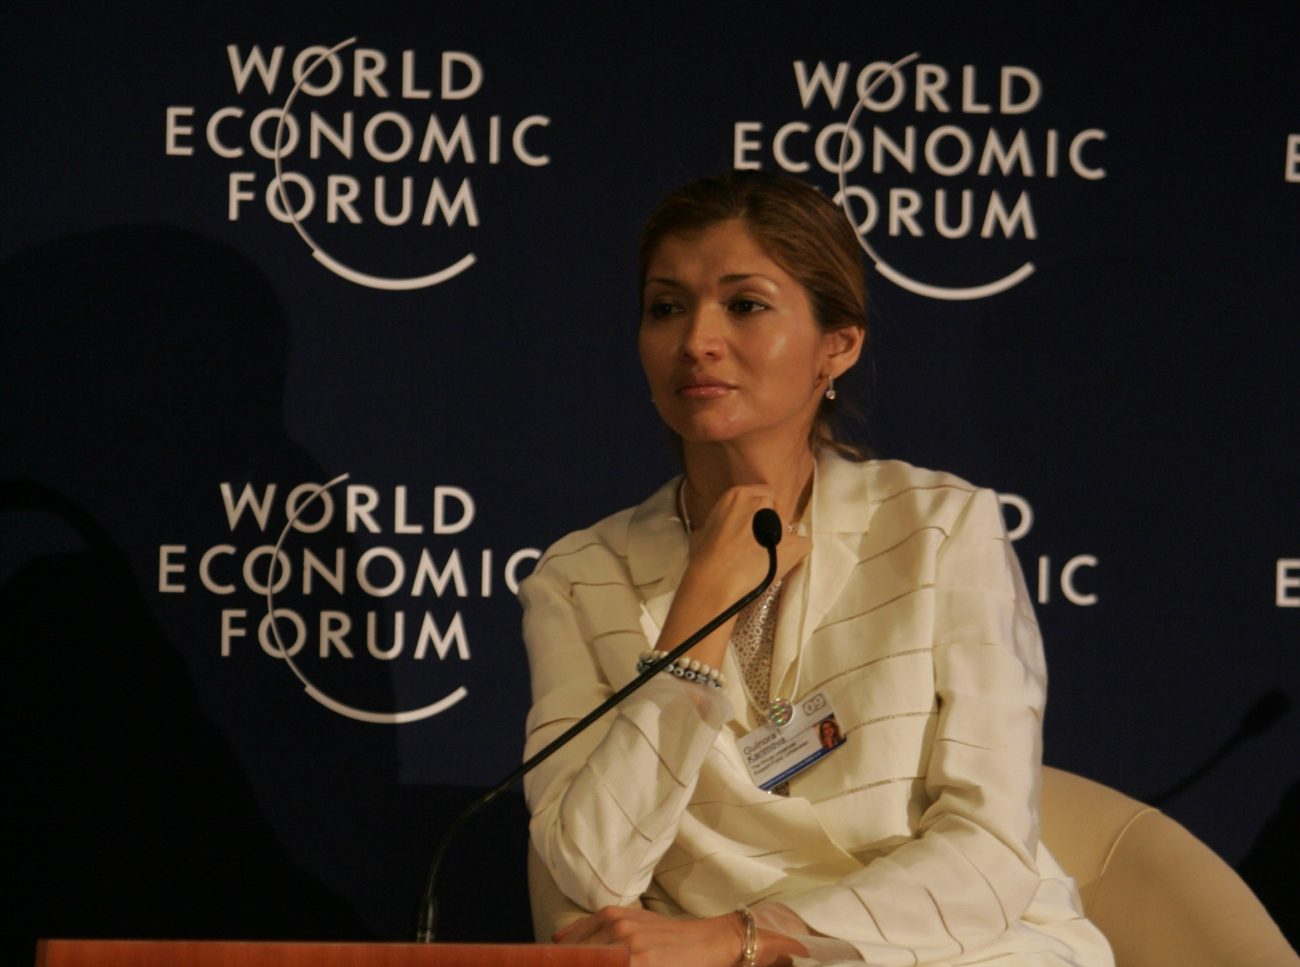 Ouzbékistan France Corruption Justice Criminel Argent